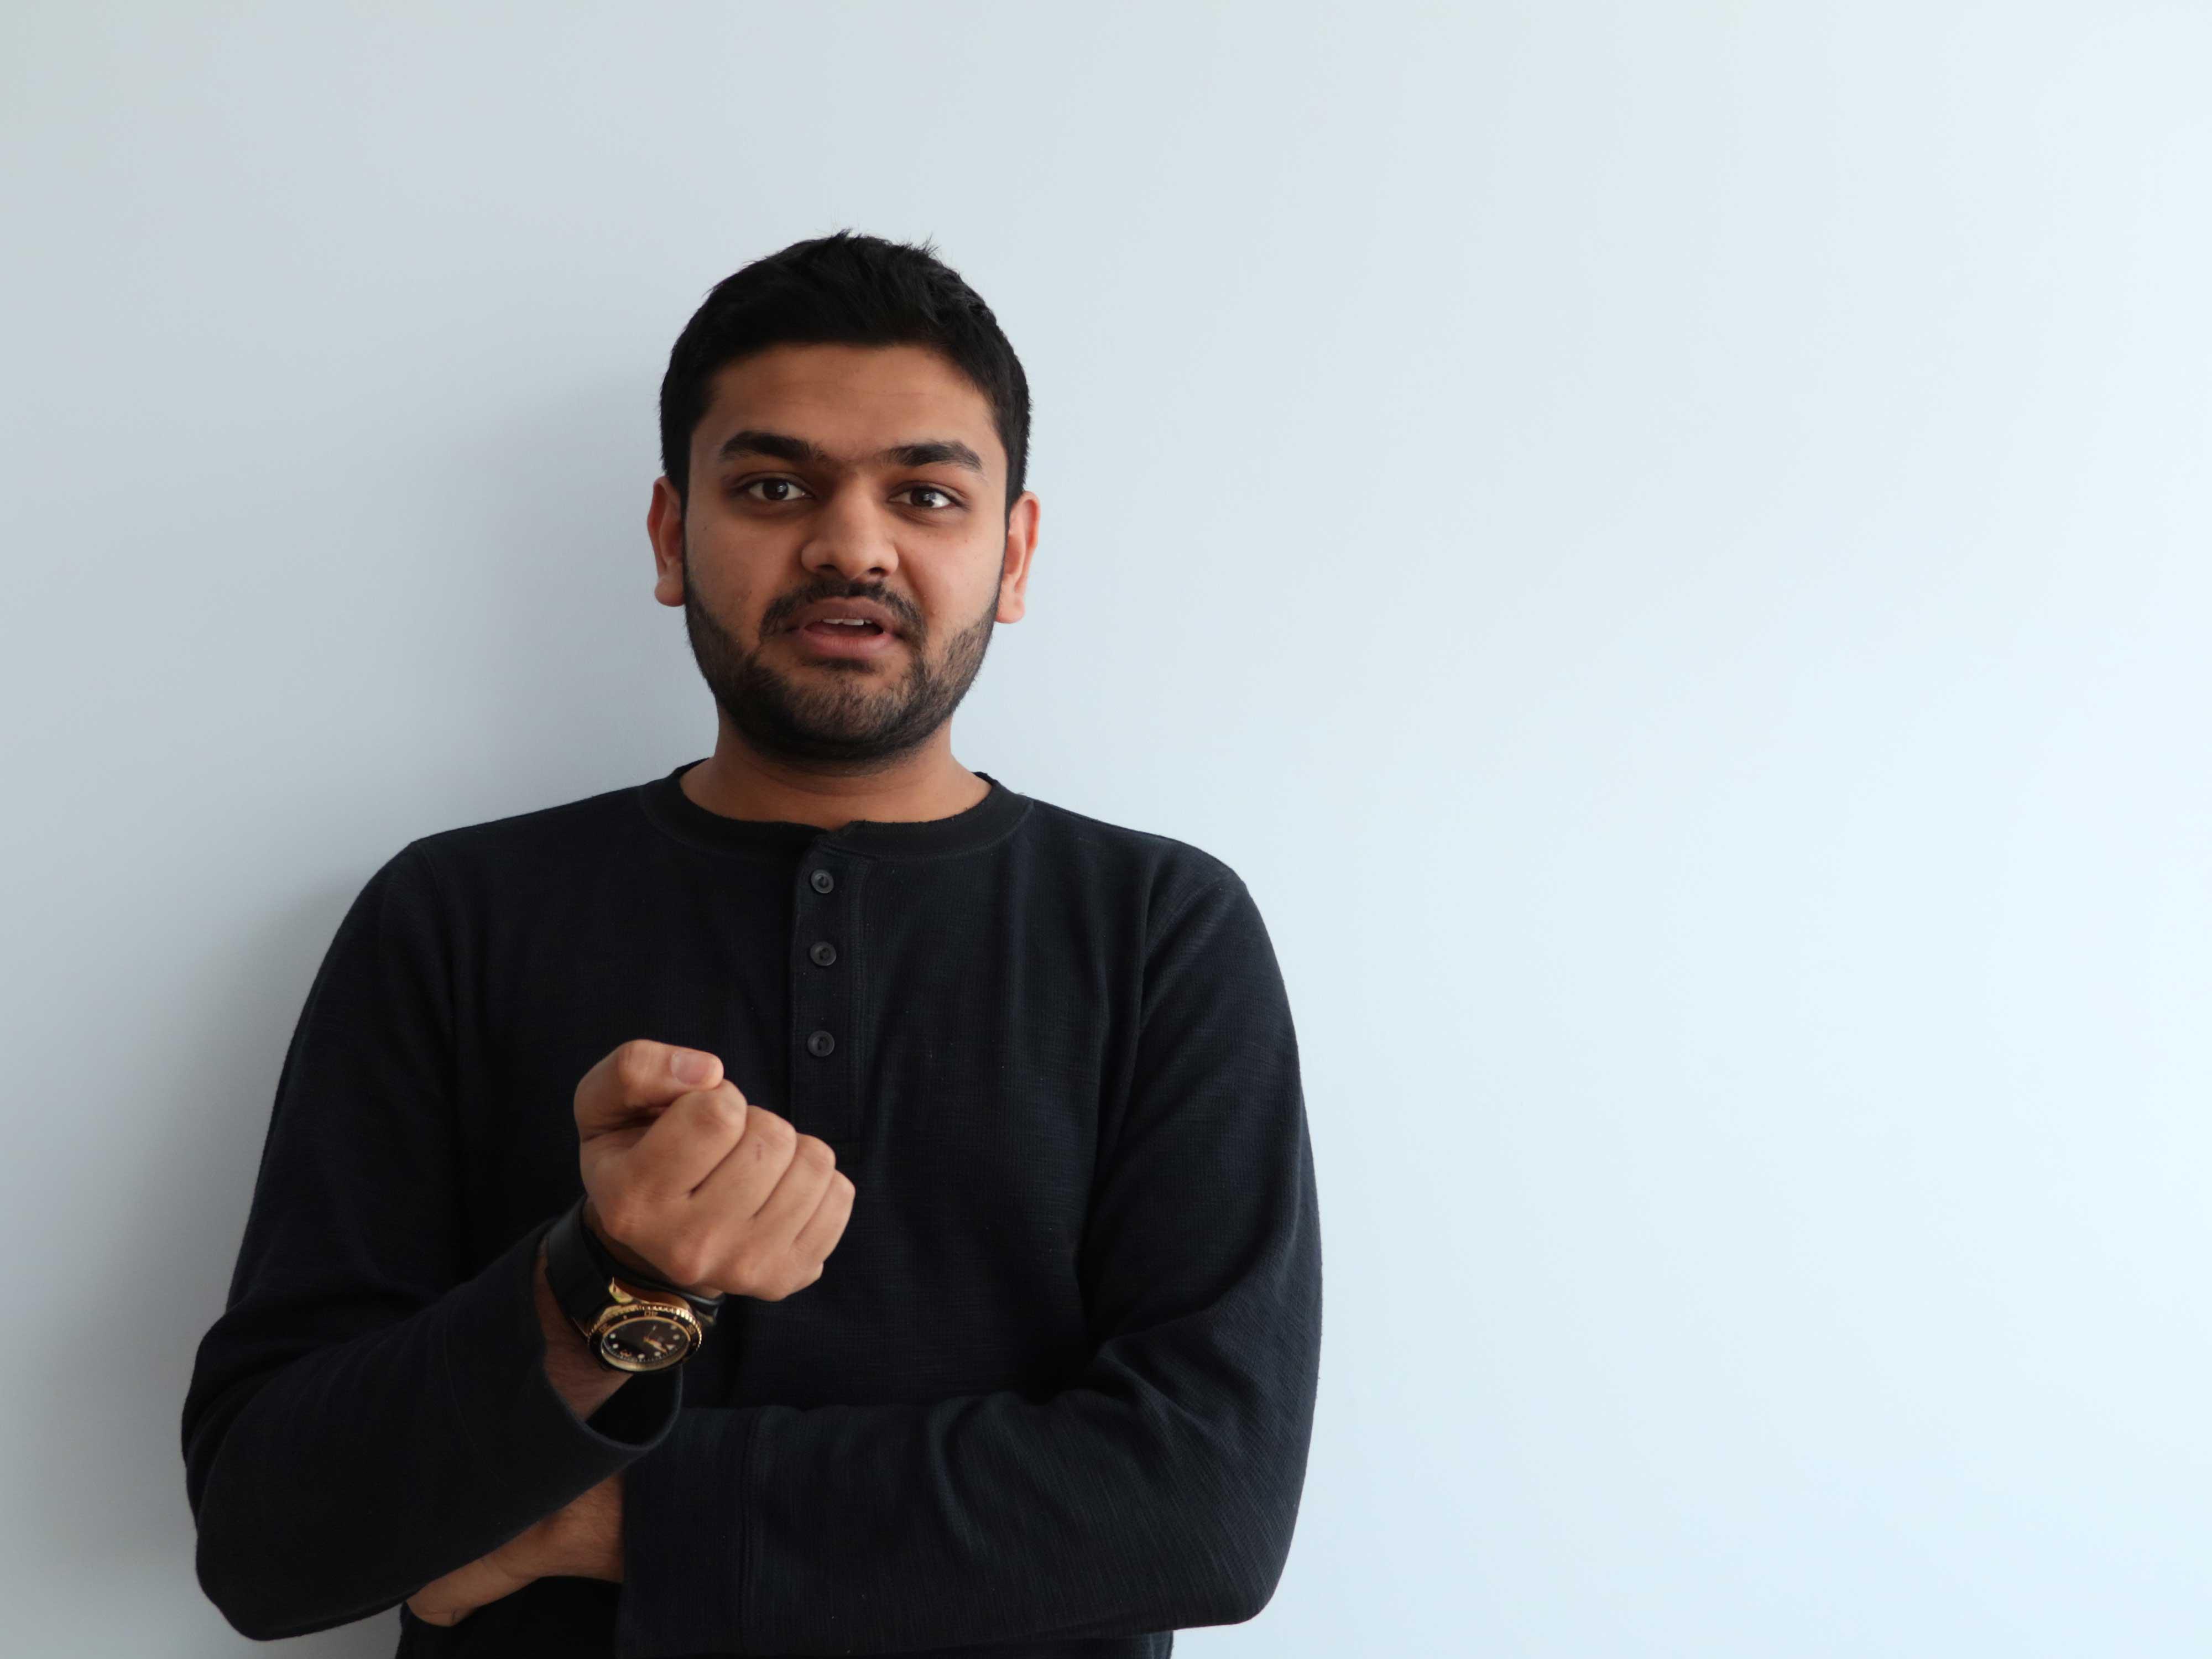 headshot of Ameen Al-Gailani in front of blank wall